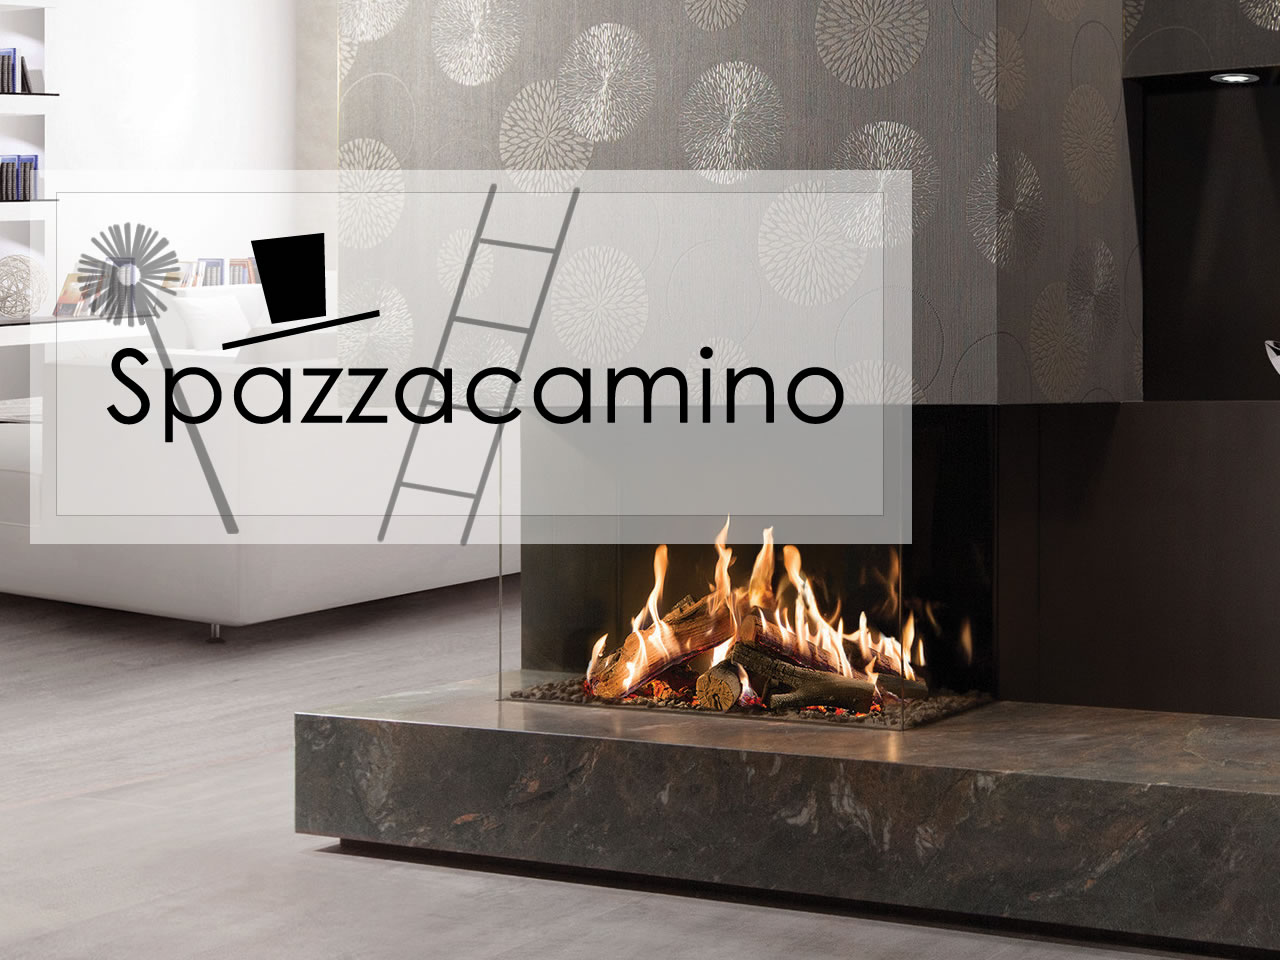 Quartiere San Leonardo Milano - Spazzacamino Canna Fumaria a Quartiere San Leonardo Milano